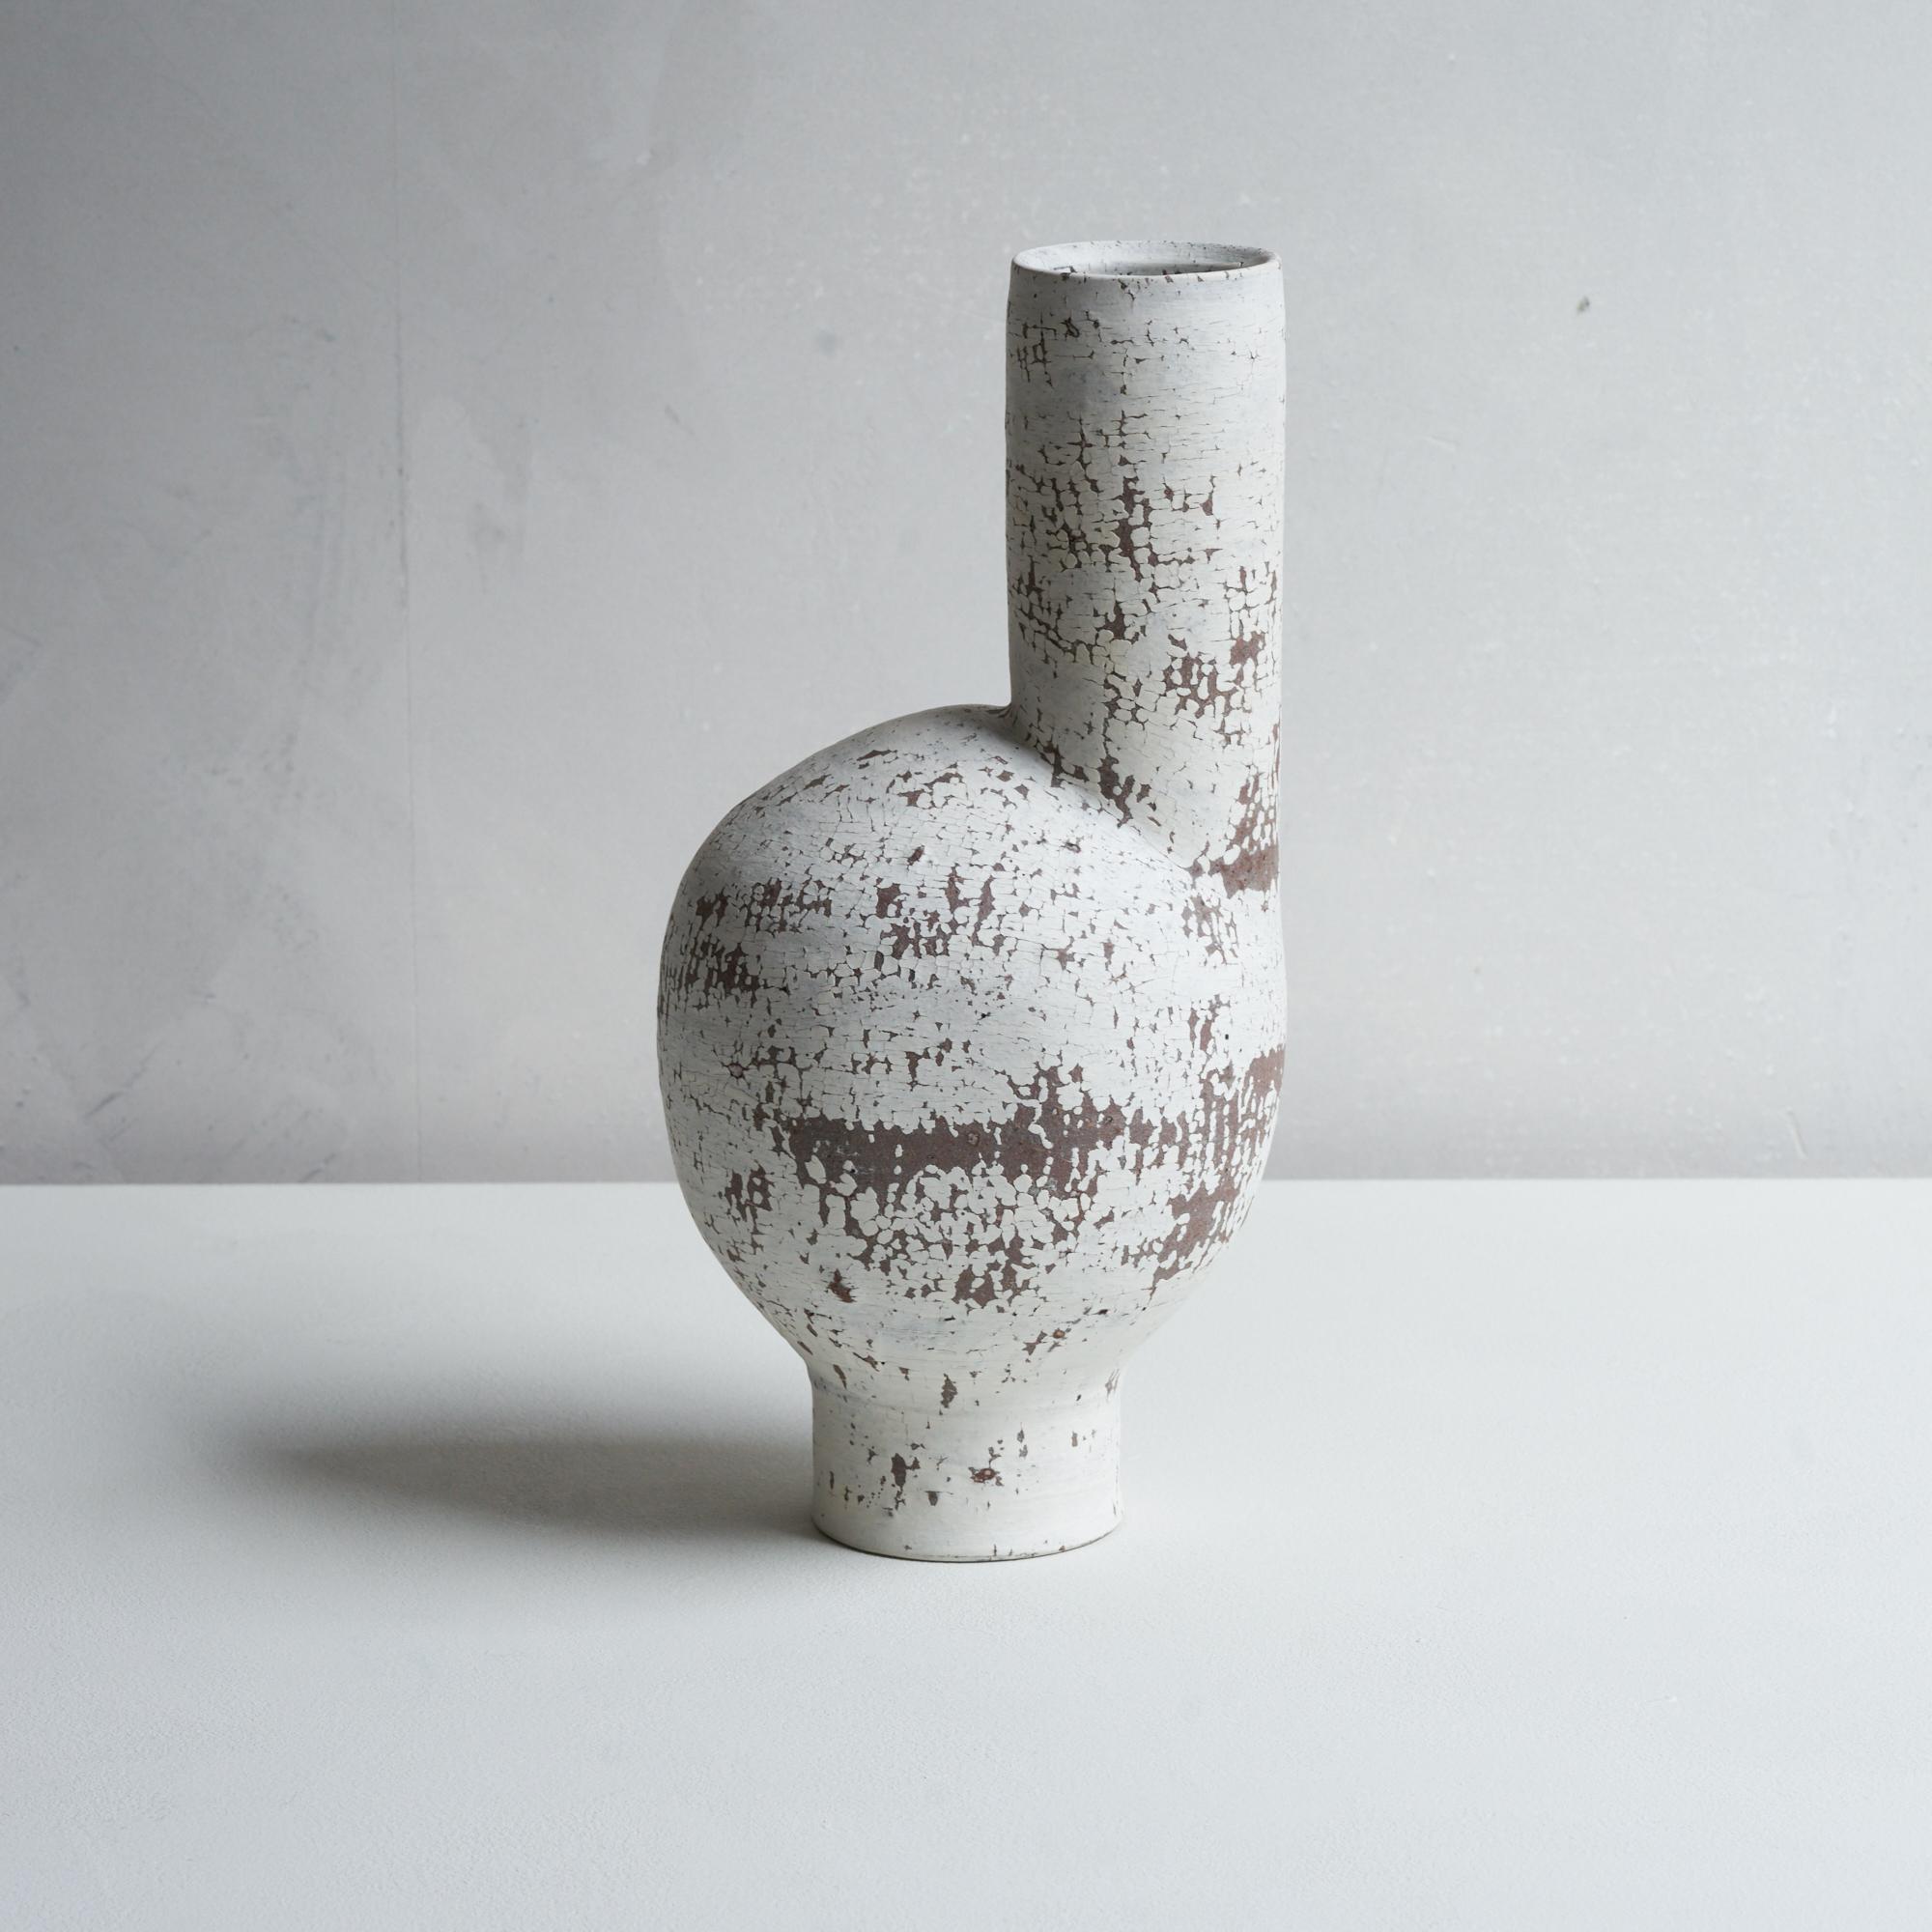 Matthias Kaiser Cracked Sliped Wayward Vase